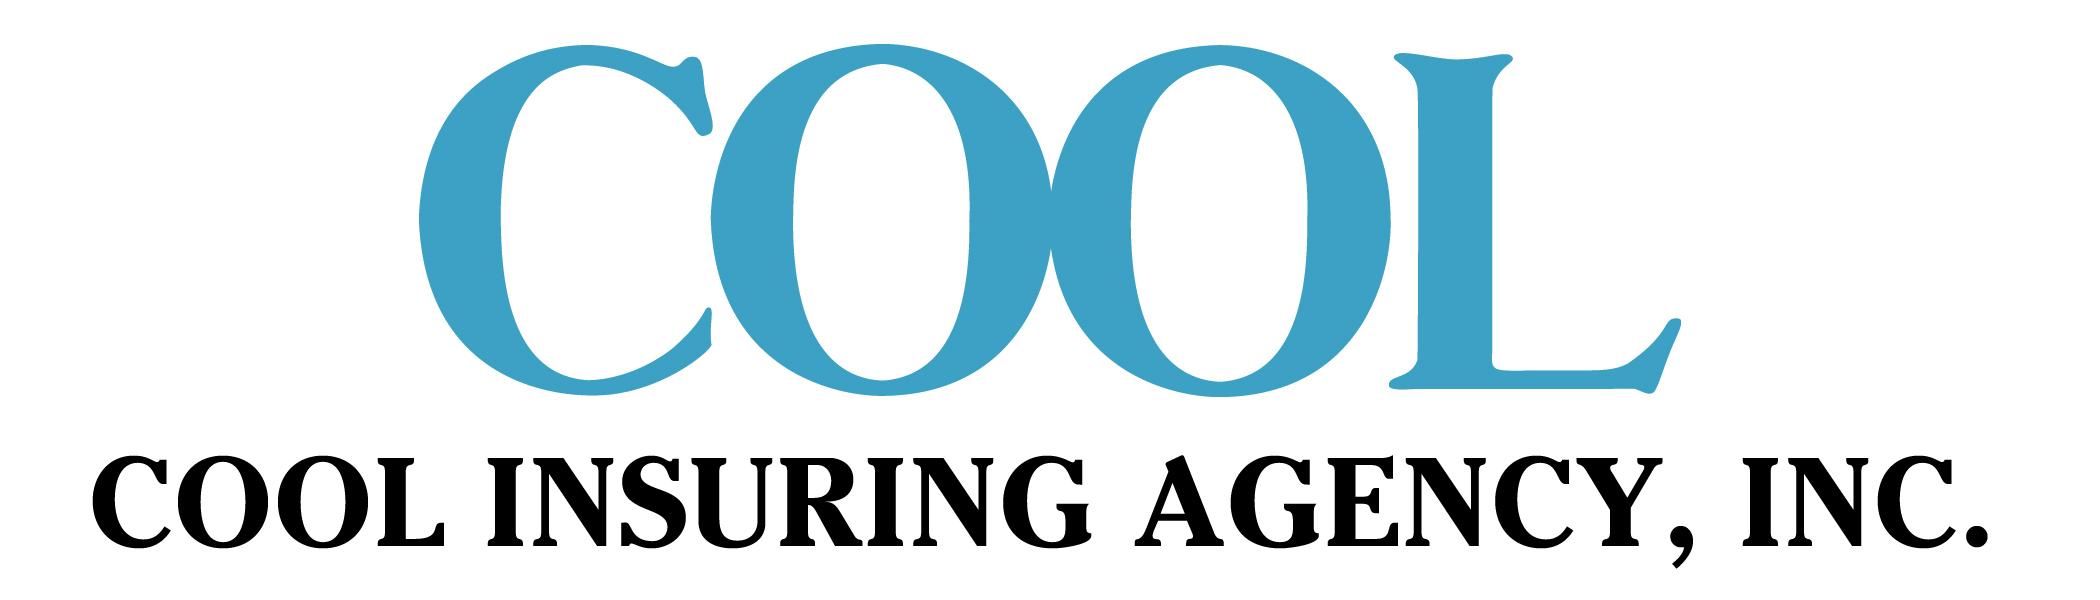 Cool Insuring Agency